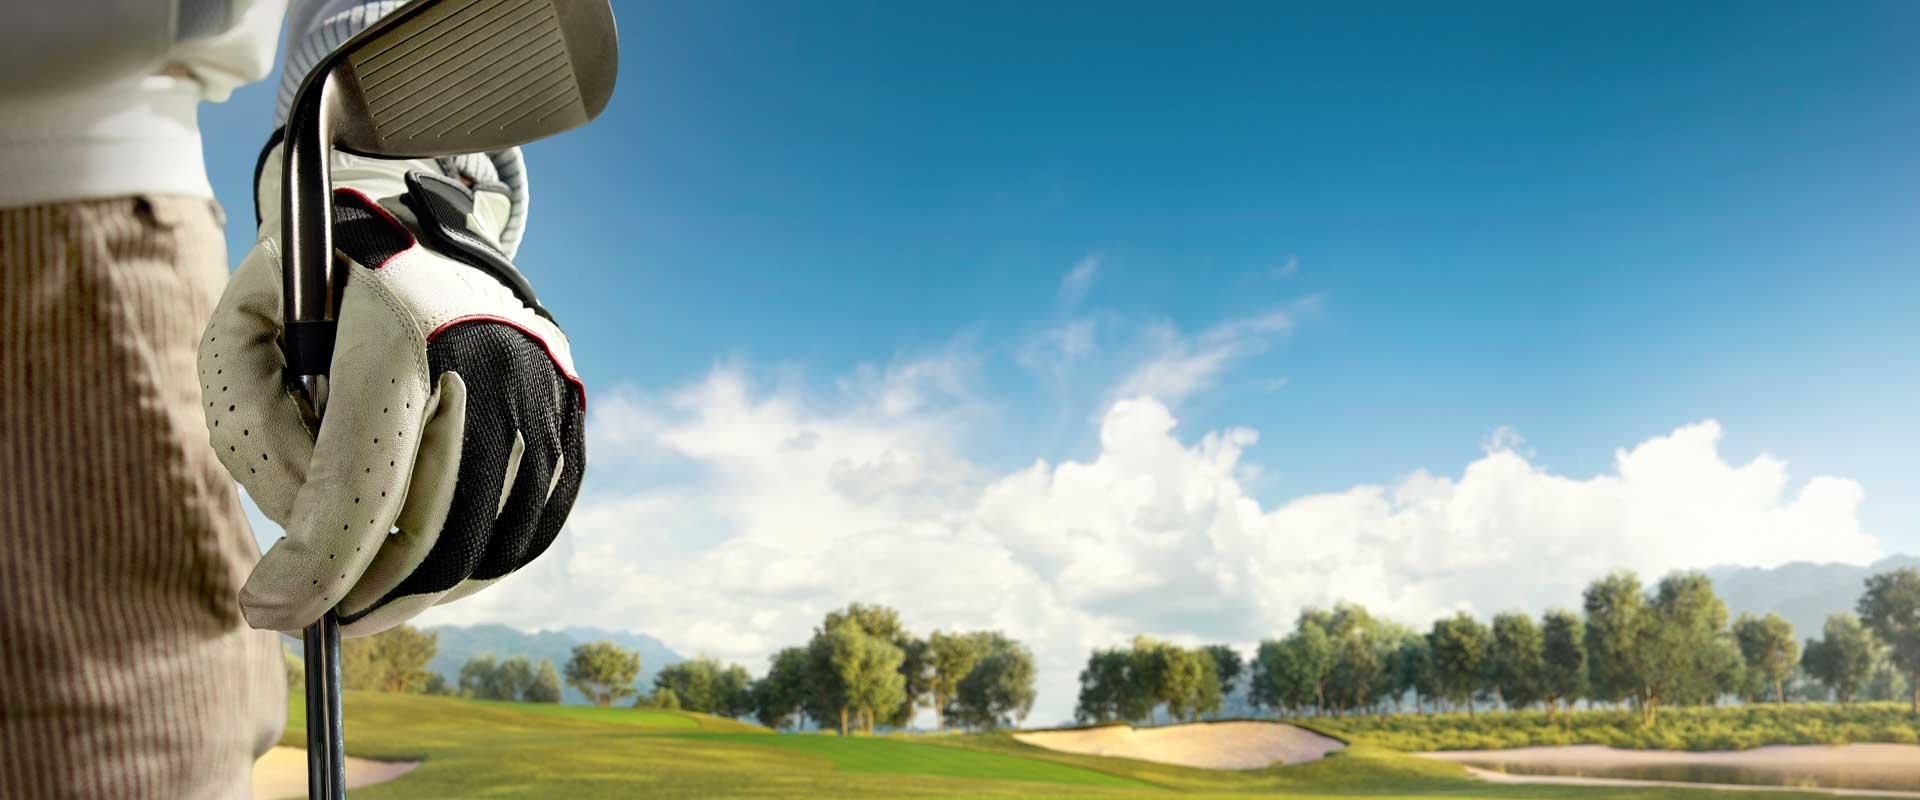 Whirlpool Public Golf Course